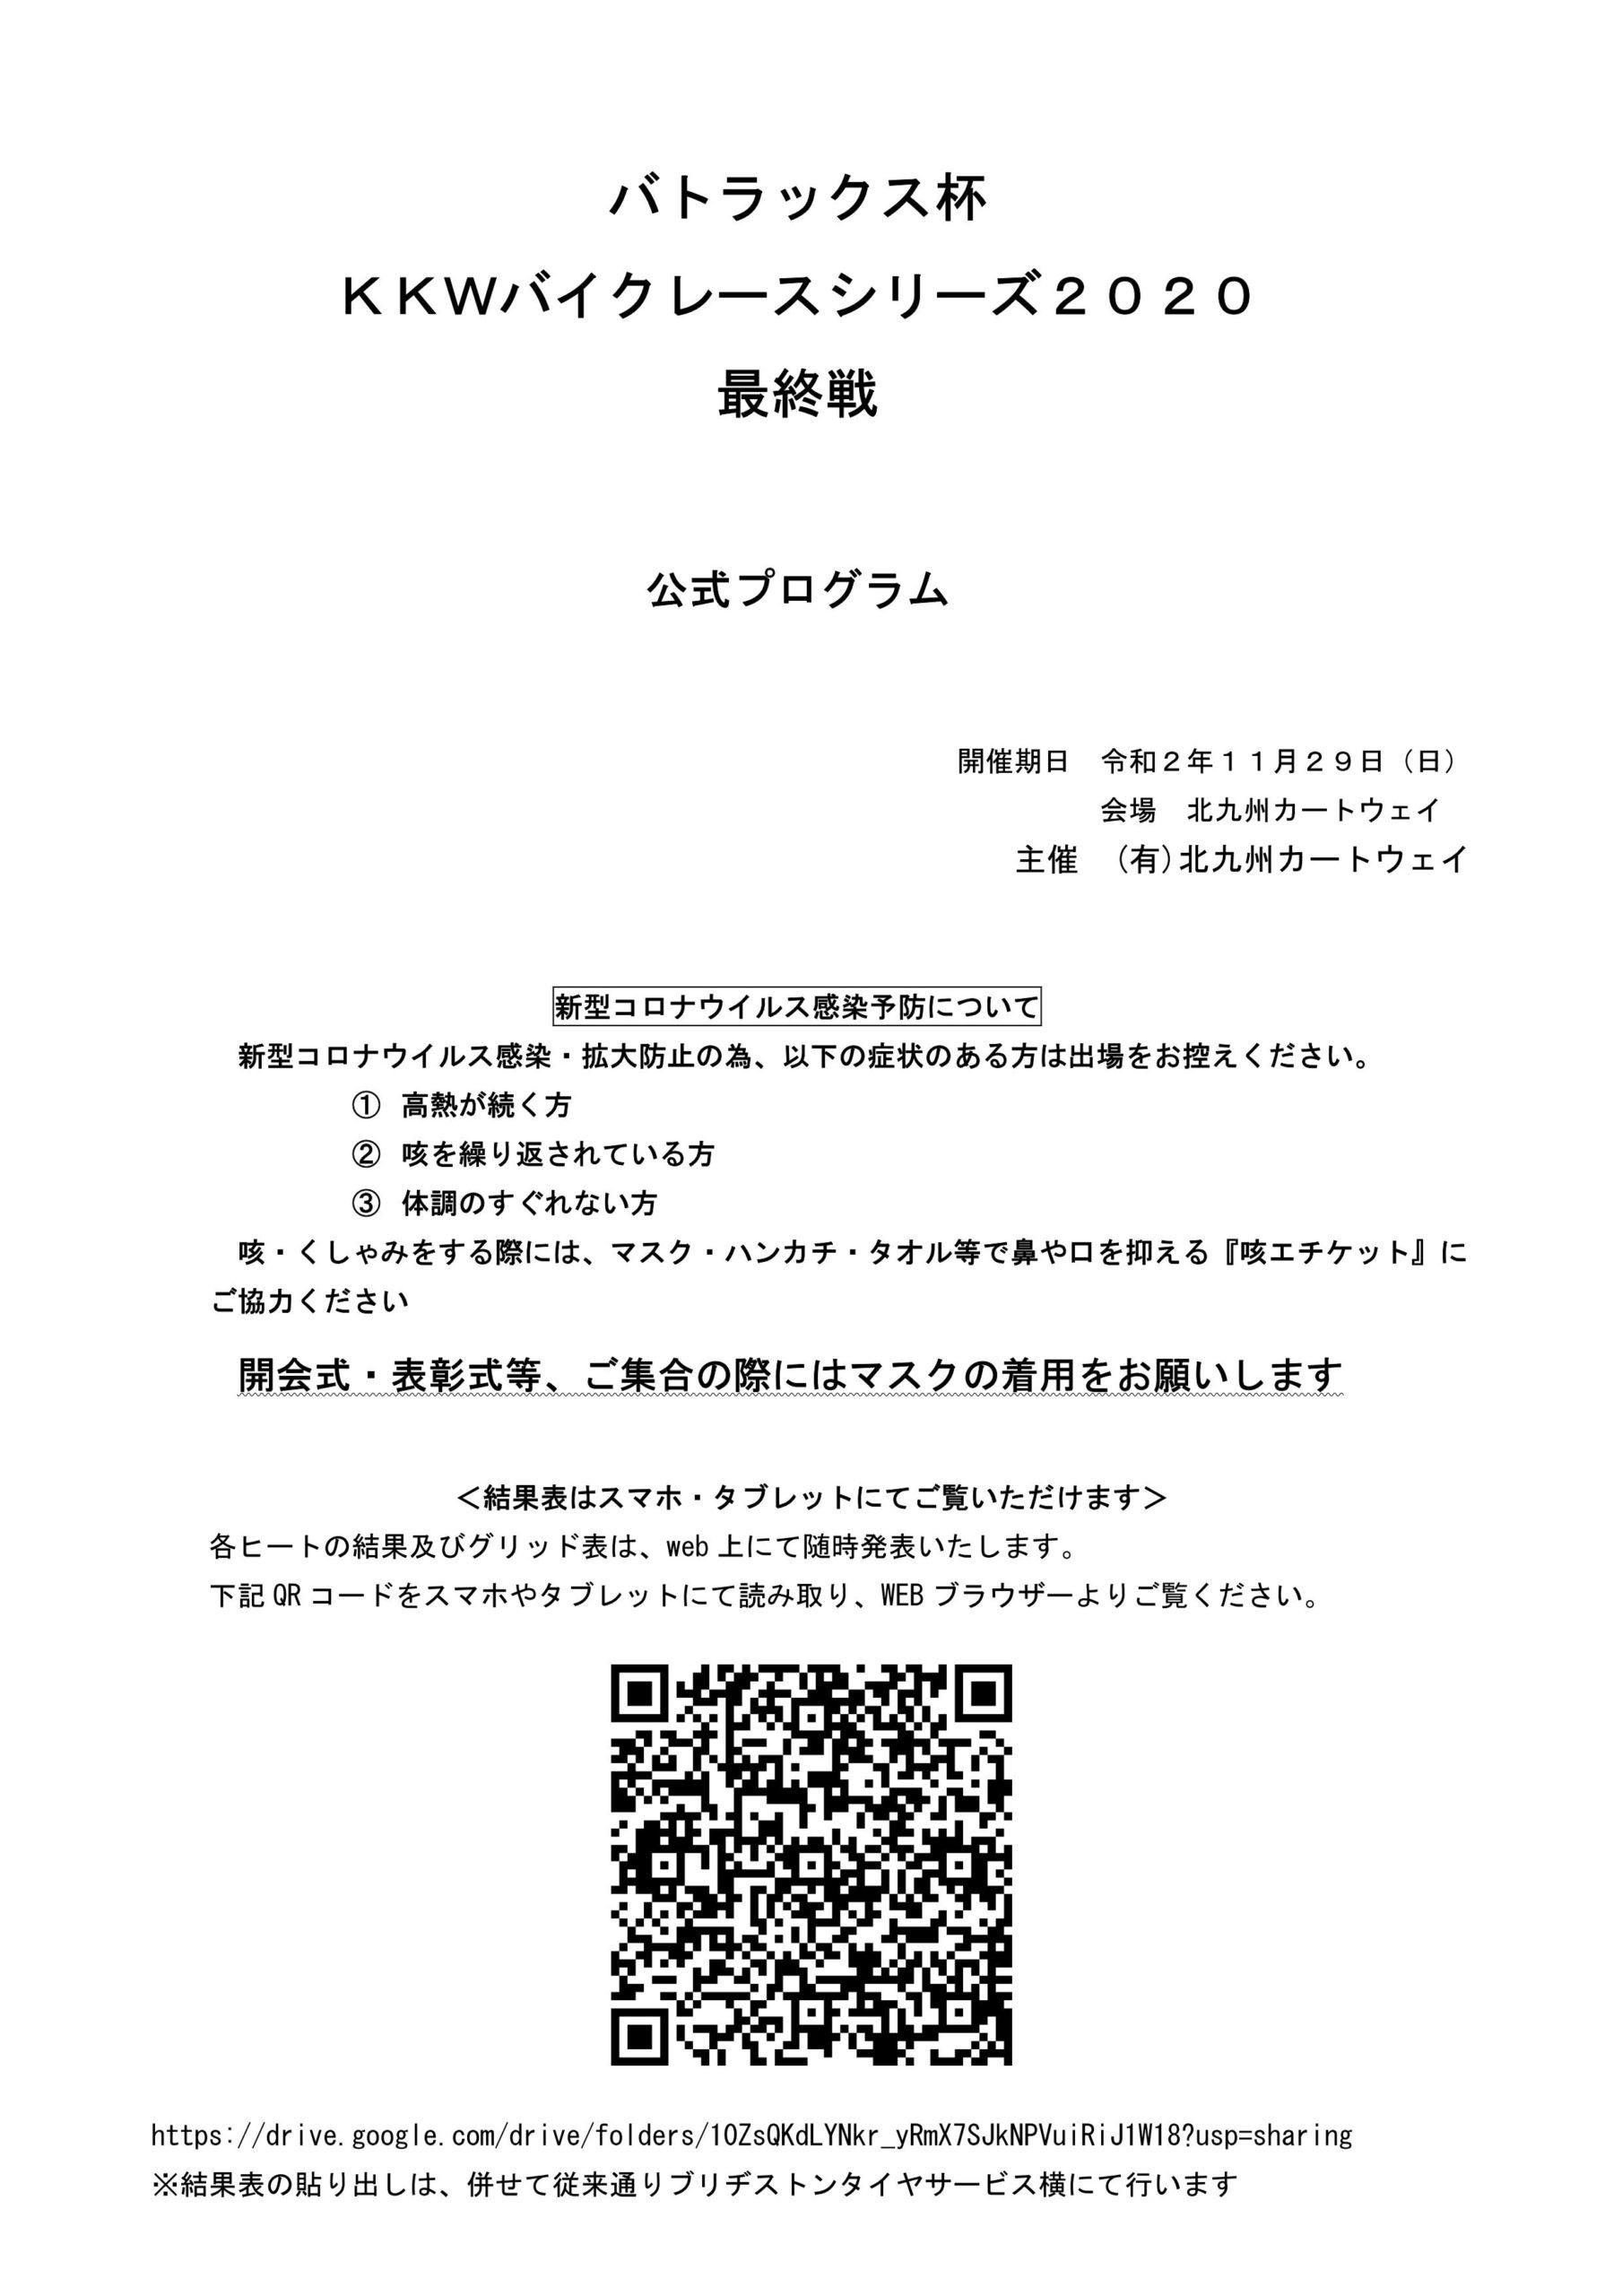 "<span class=""title"">重要!11/29KKW最終戦参加者必読</span>"